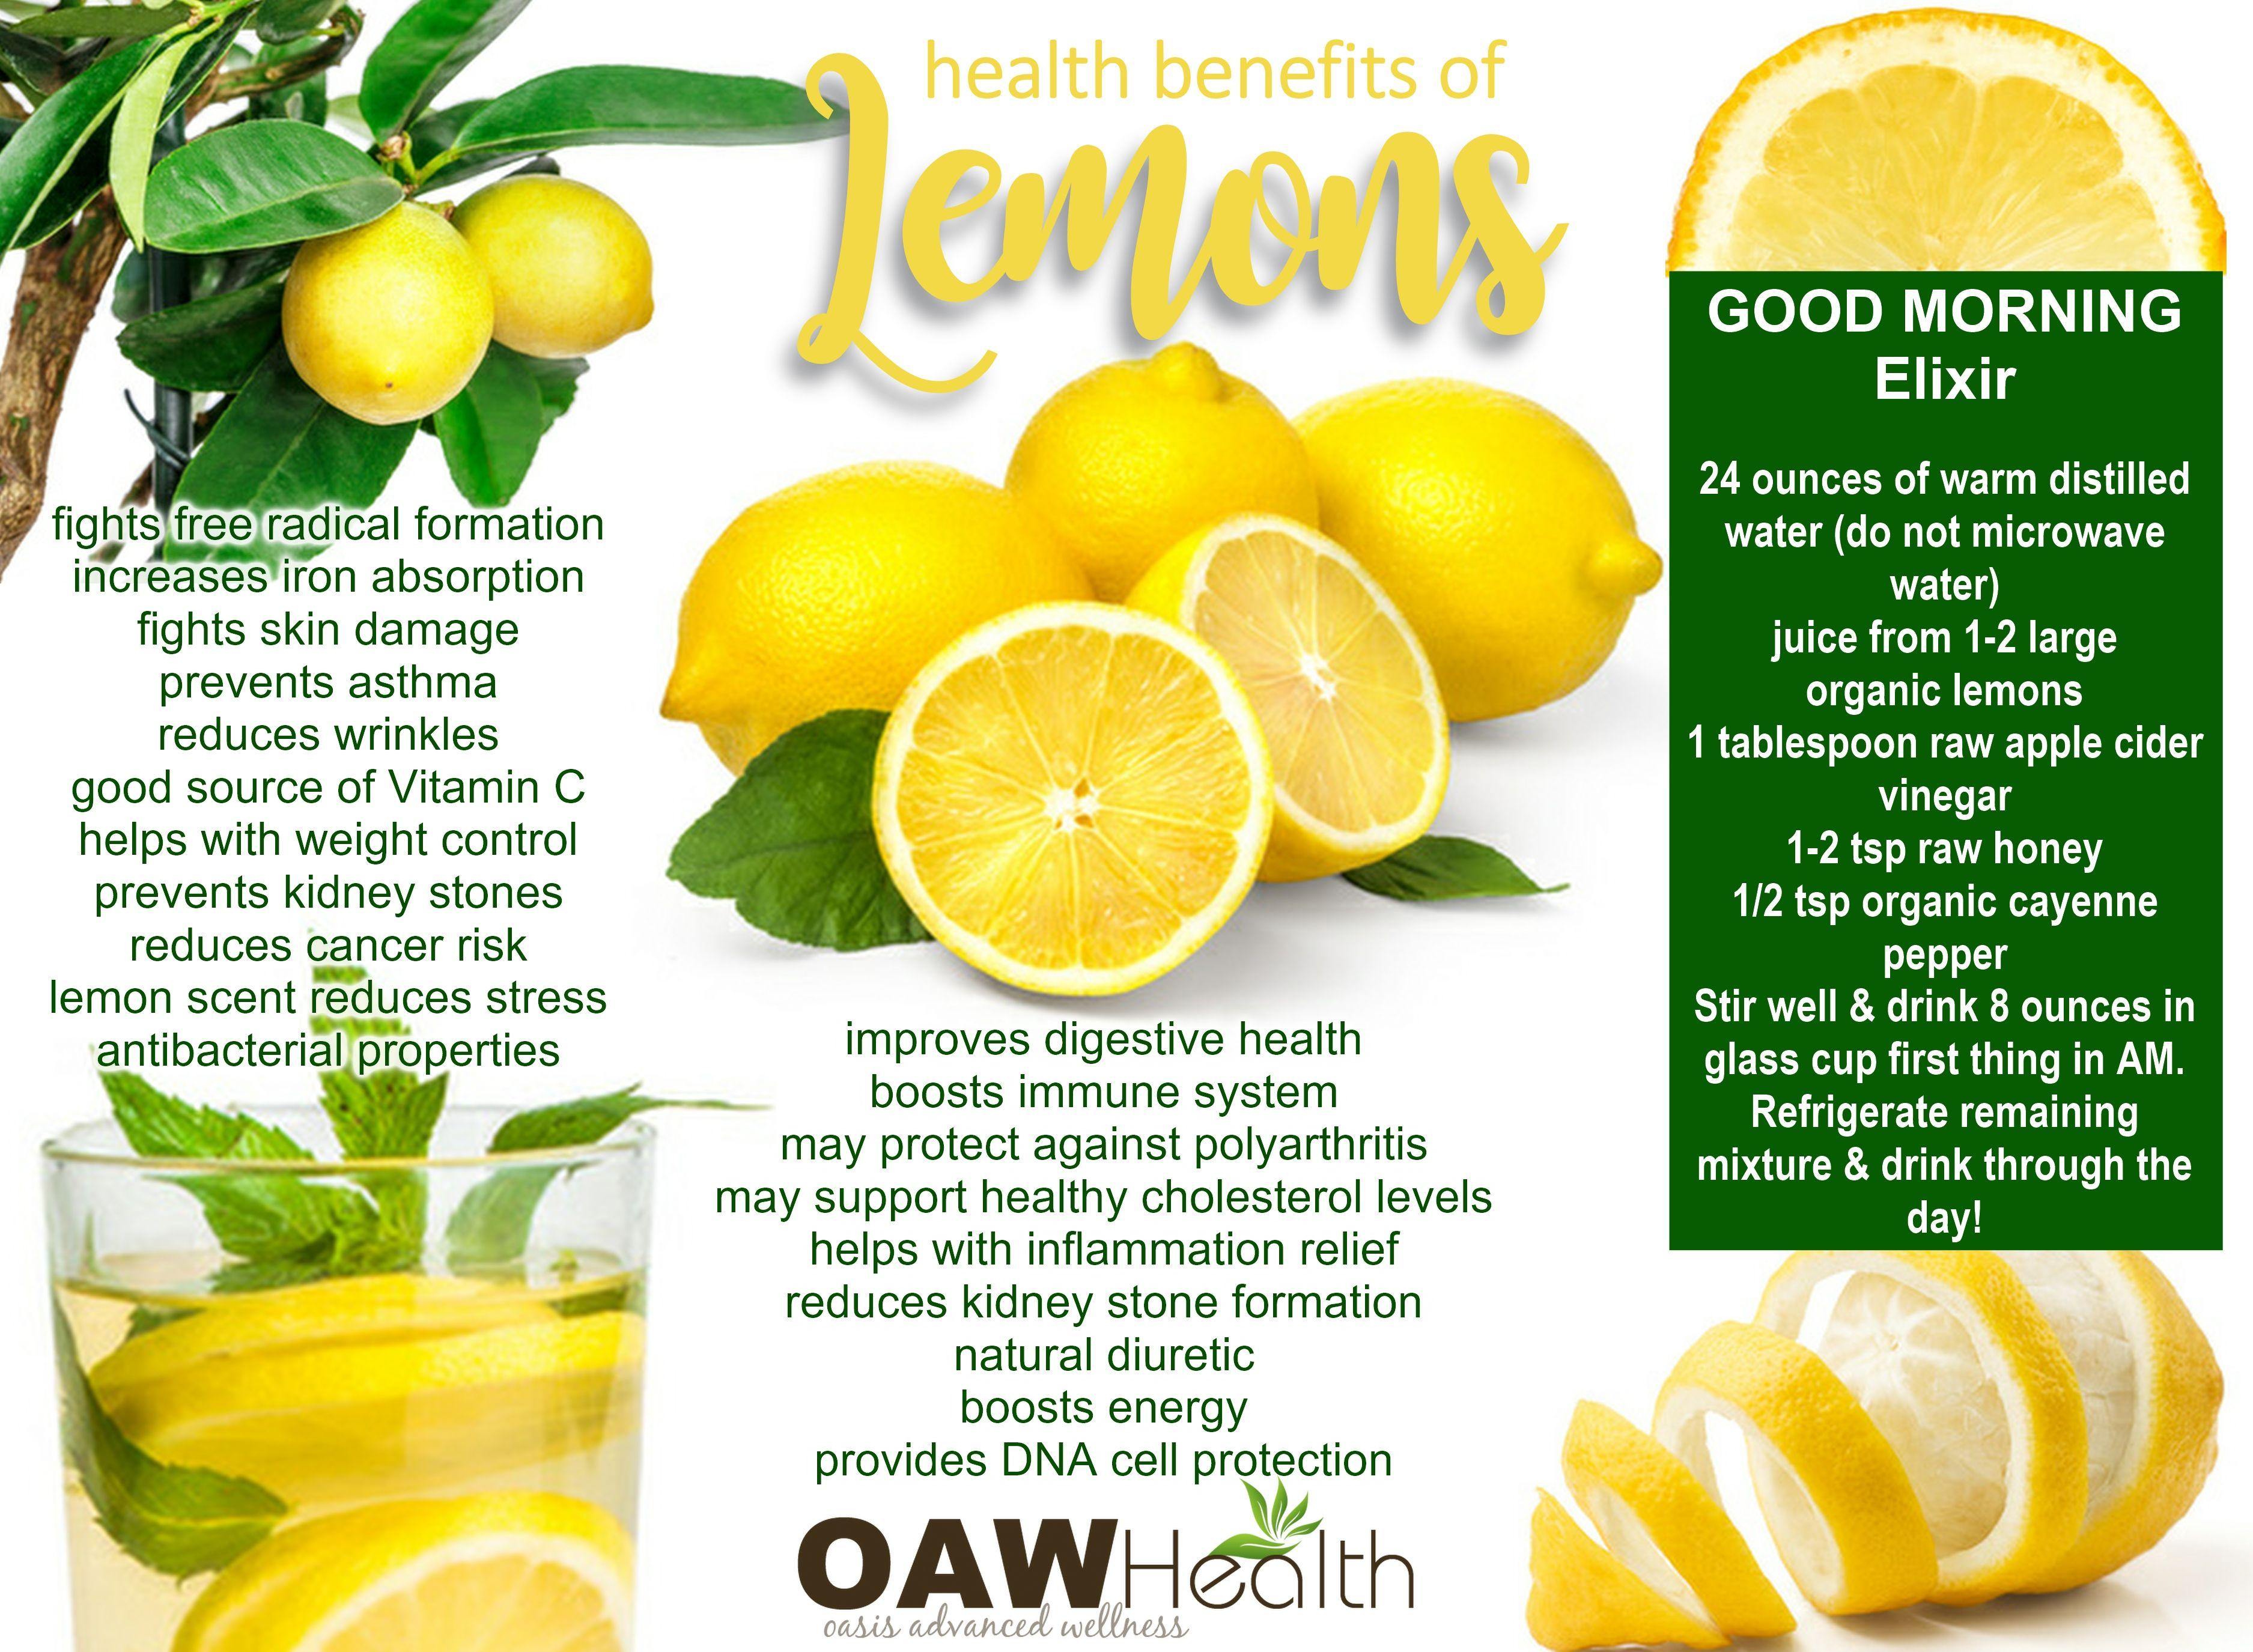 20 health benefits of lemons | lemon health benefits, lime